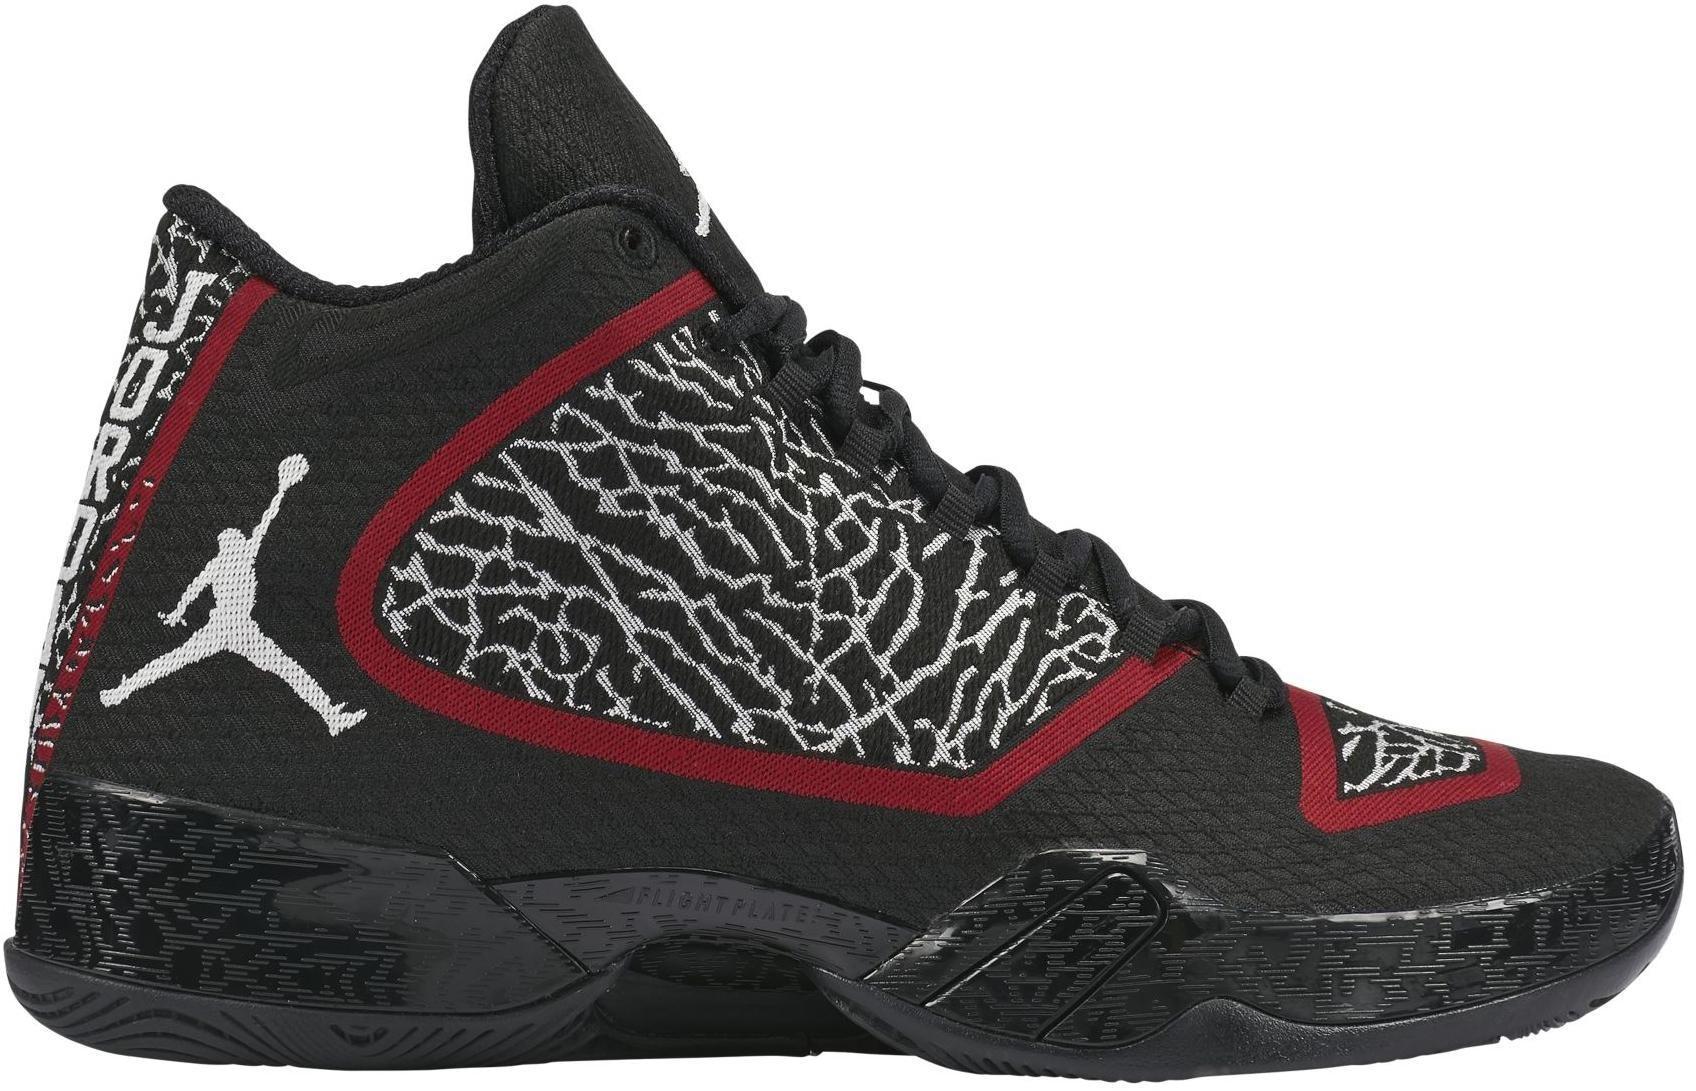 New Arrival Nike Air Jordan XX9 Black White-Gym Red 695515 023